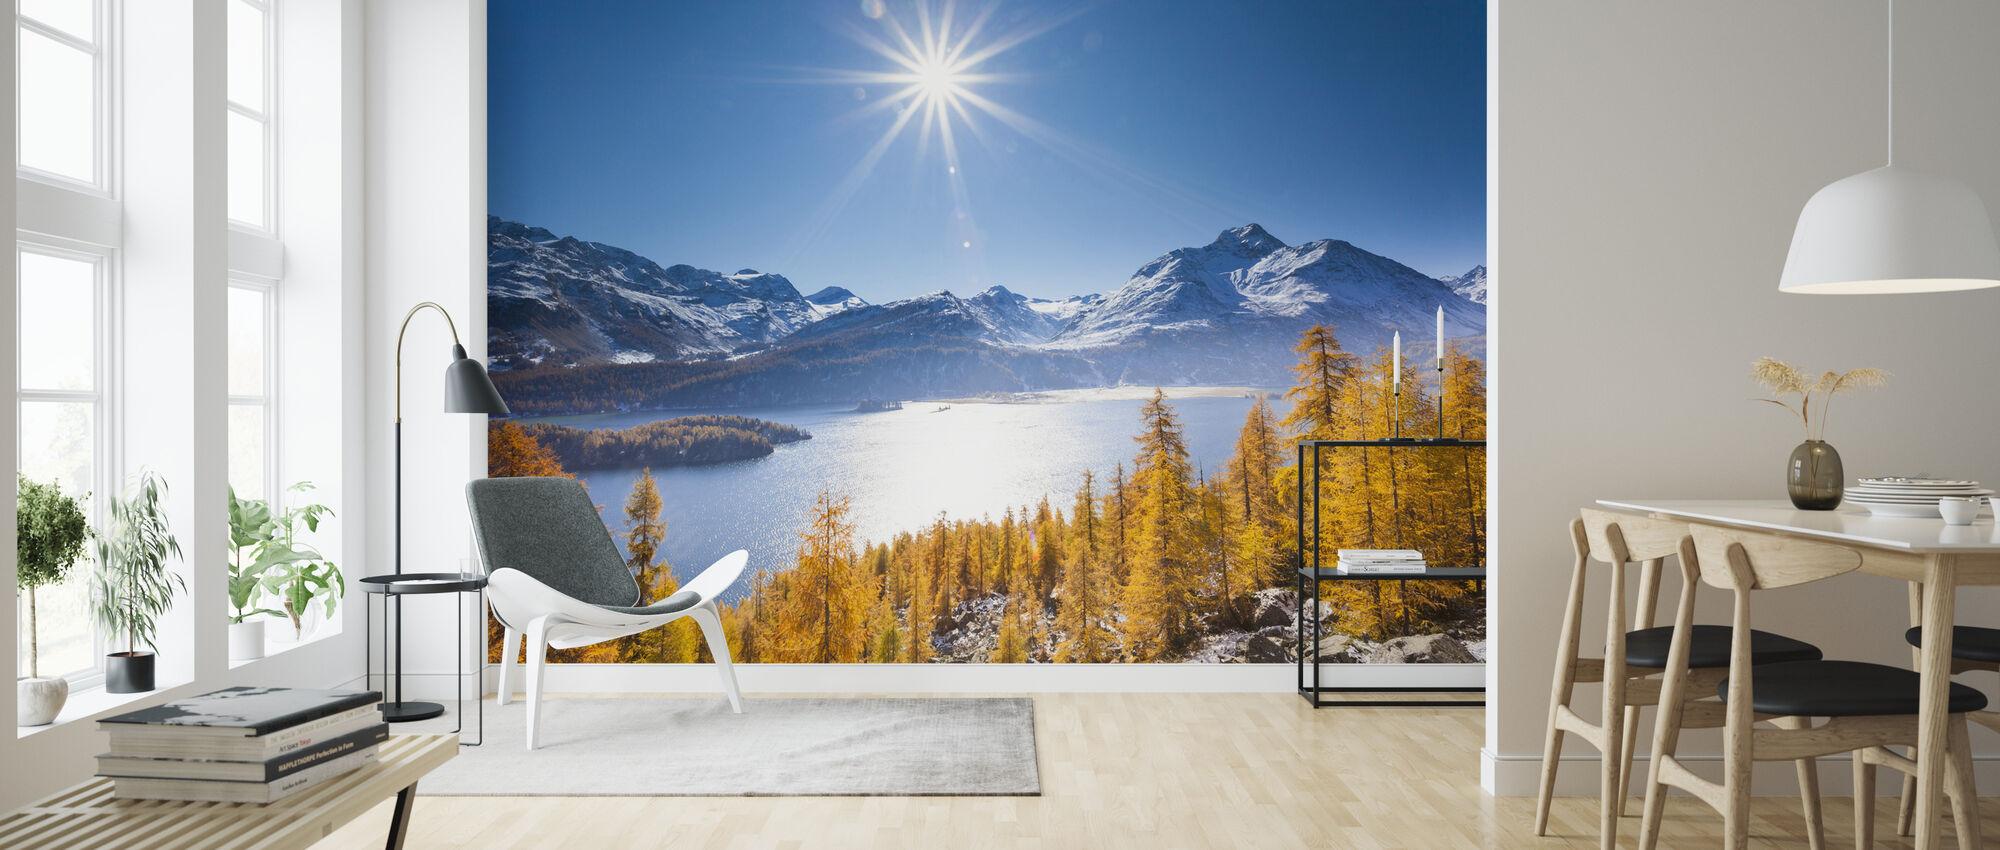 Graubunden, Sveits - Tapet - Stue